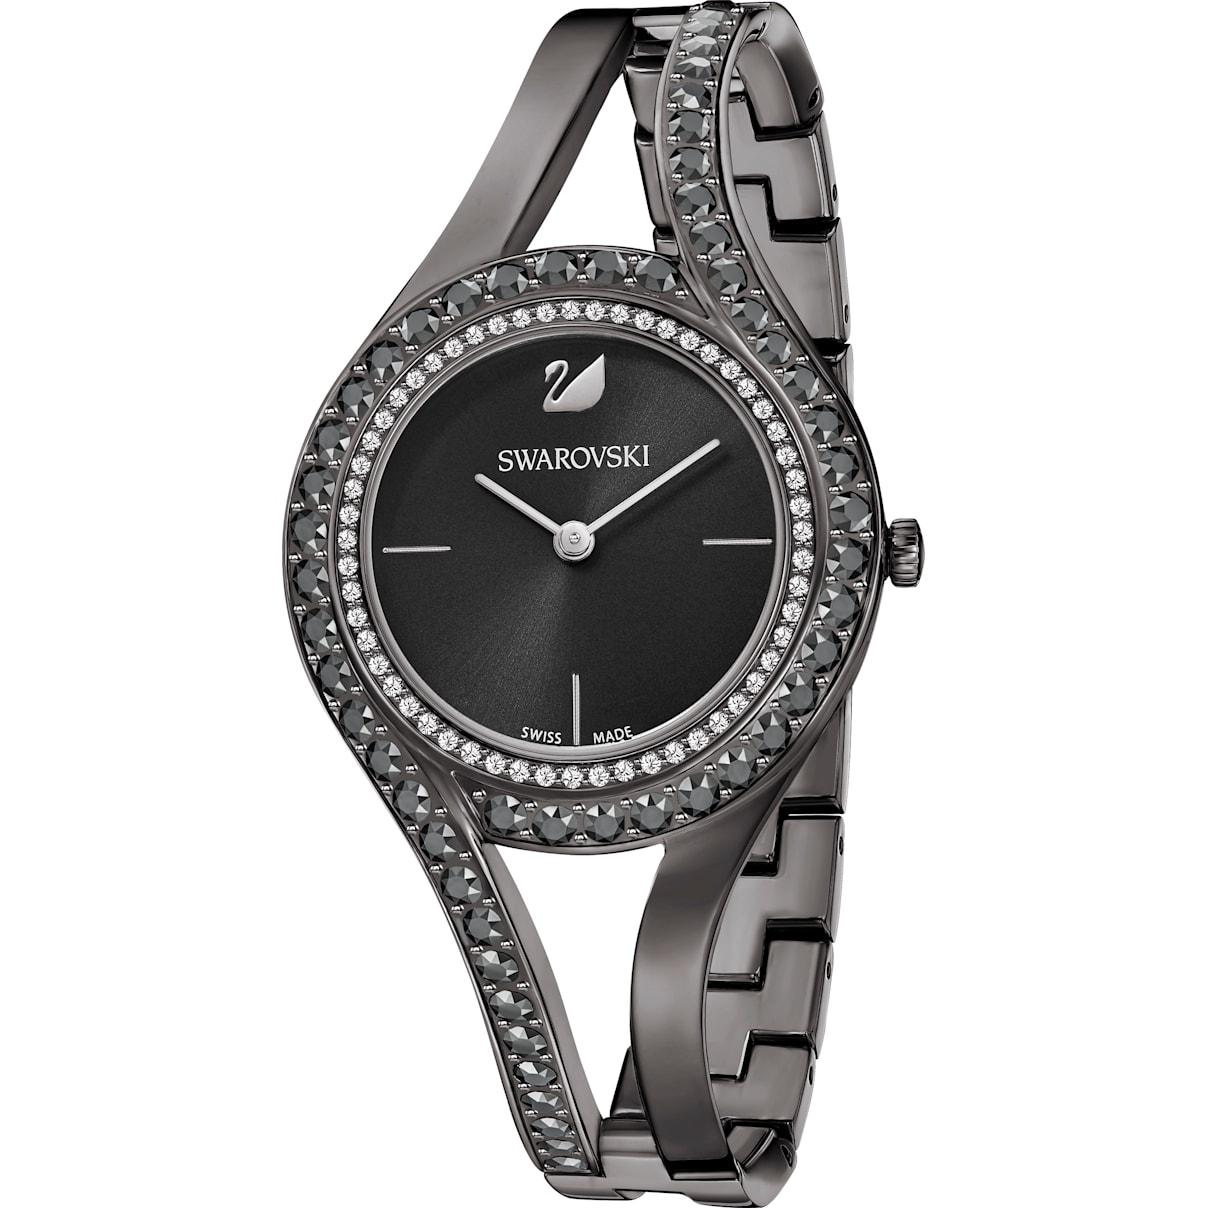 Swarovski Eternal Watch, Metal bracelet, Black, Gun-metal PVD